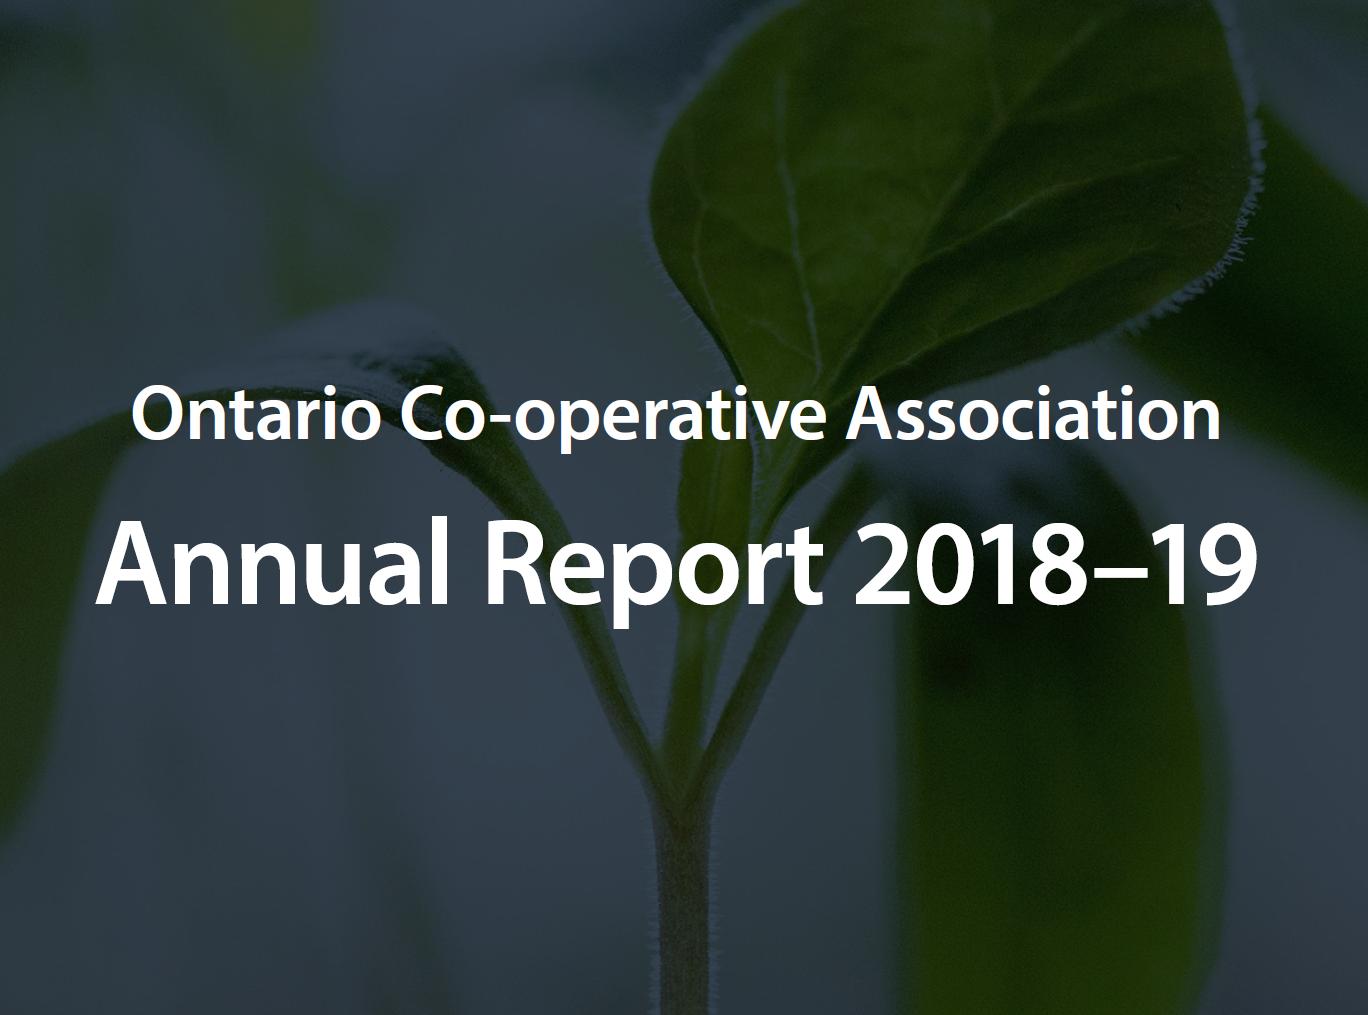 OCA Annual Report 2018-19